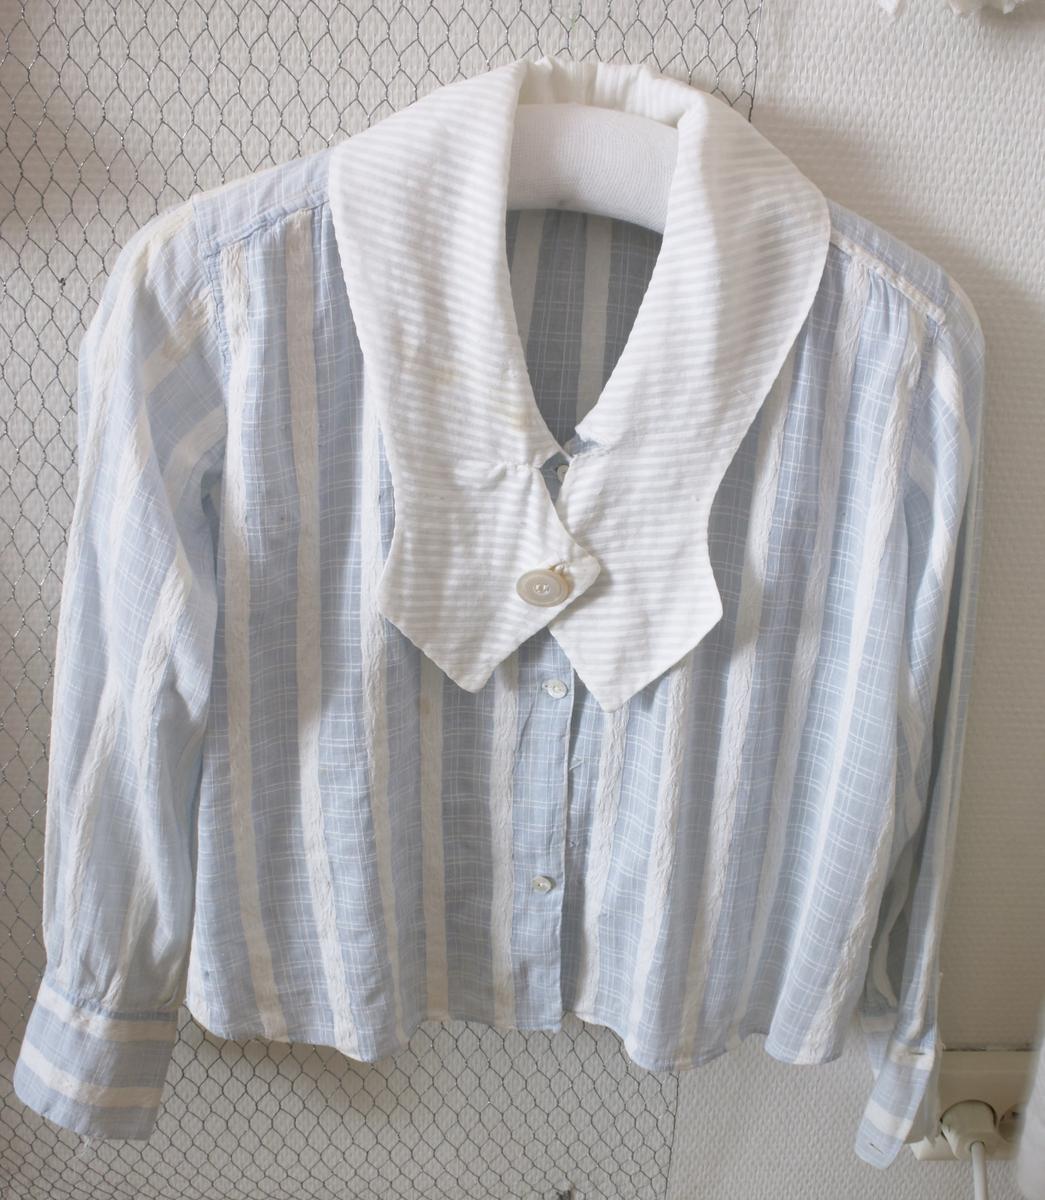 Blå og hvitstripet bluse med lange arme og stor hvit krage.